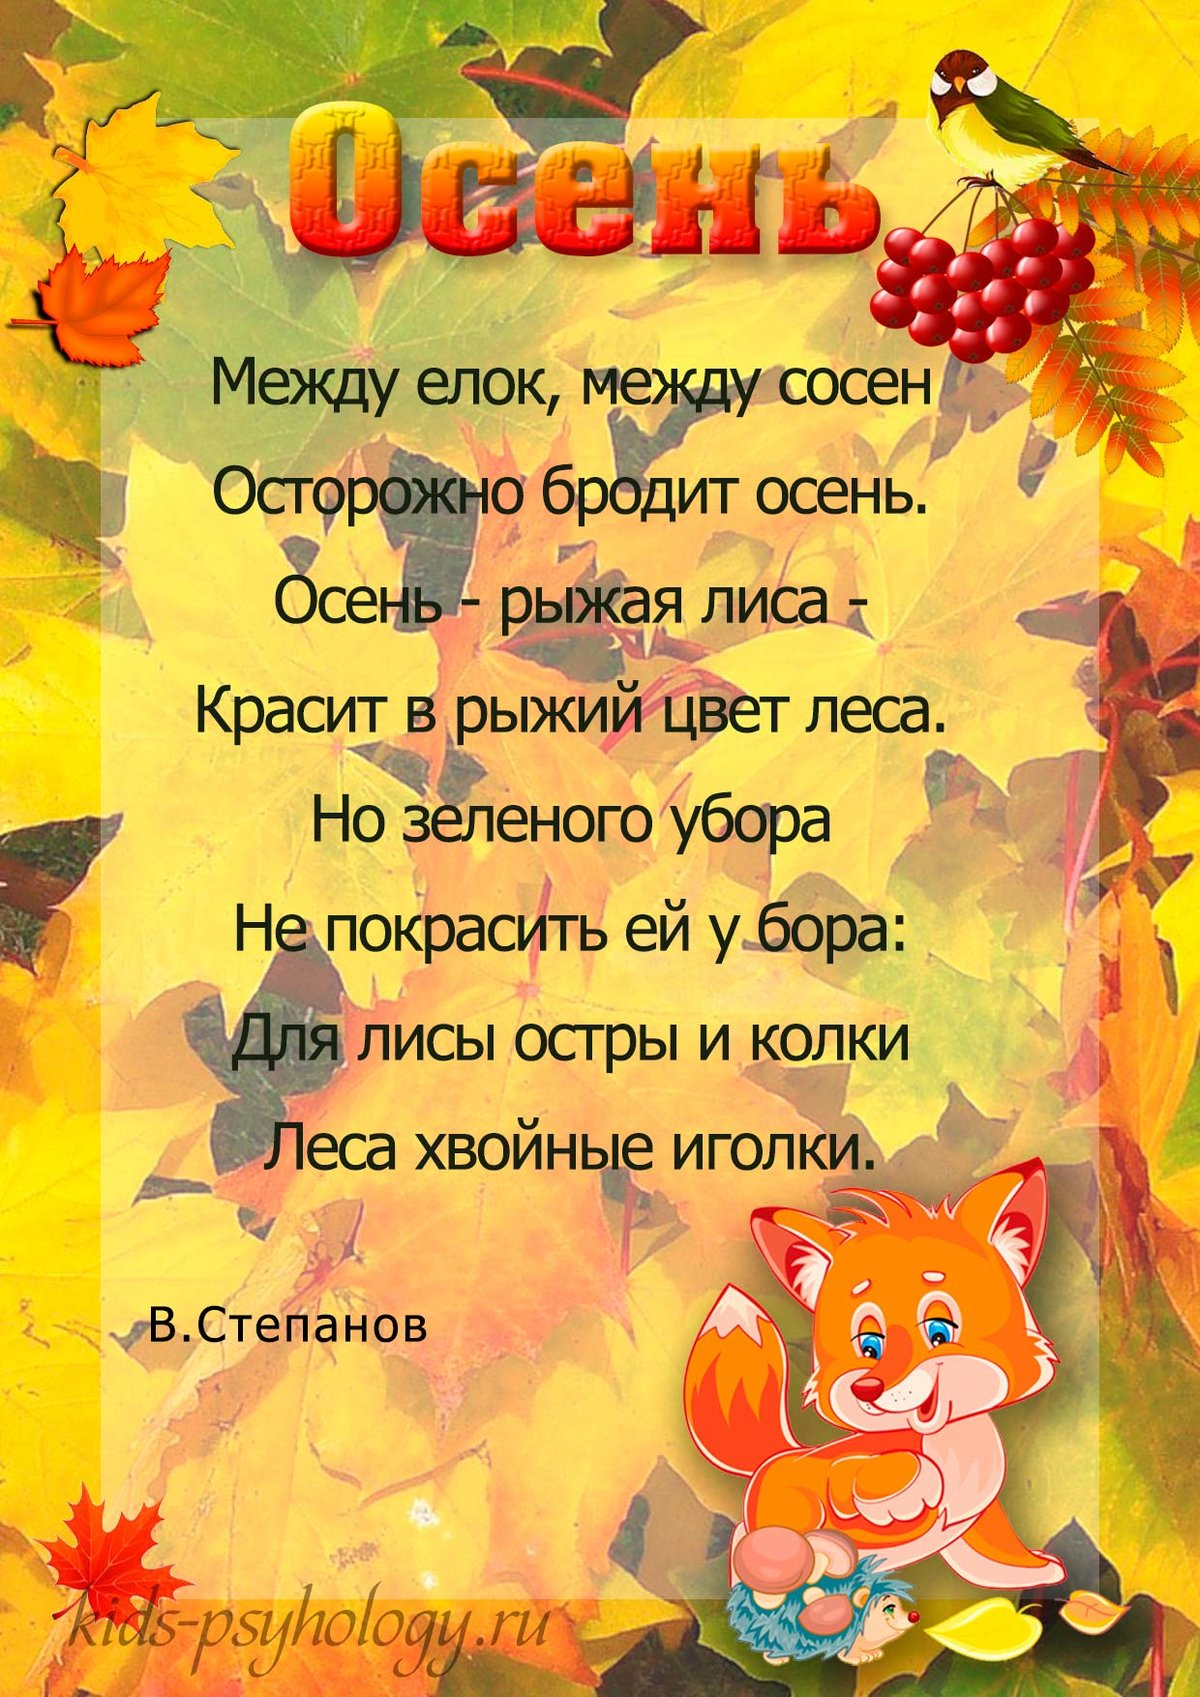 Стих про осень картинки